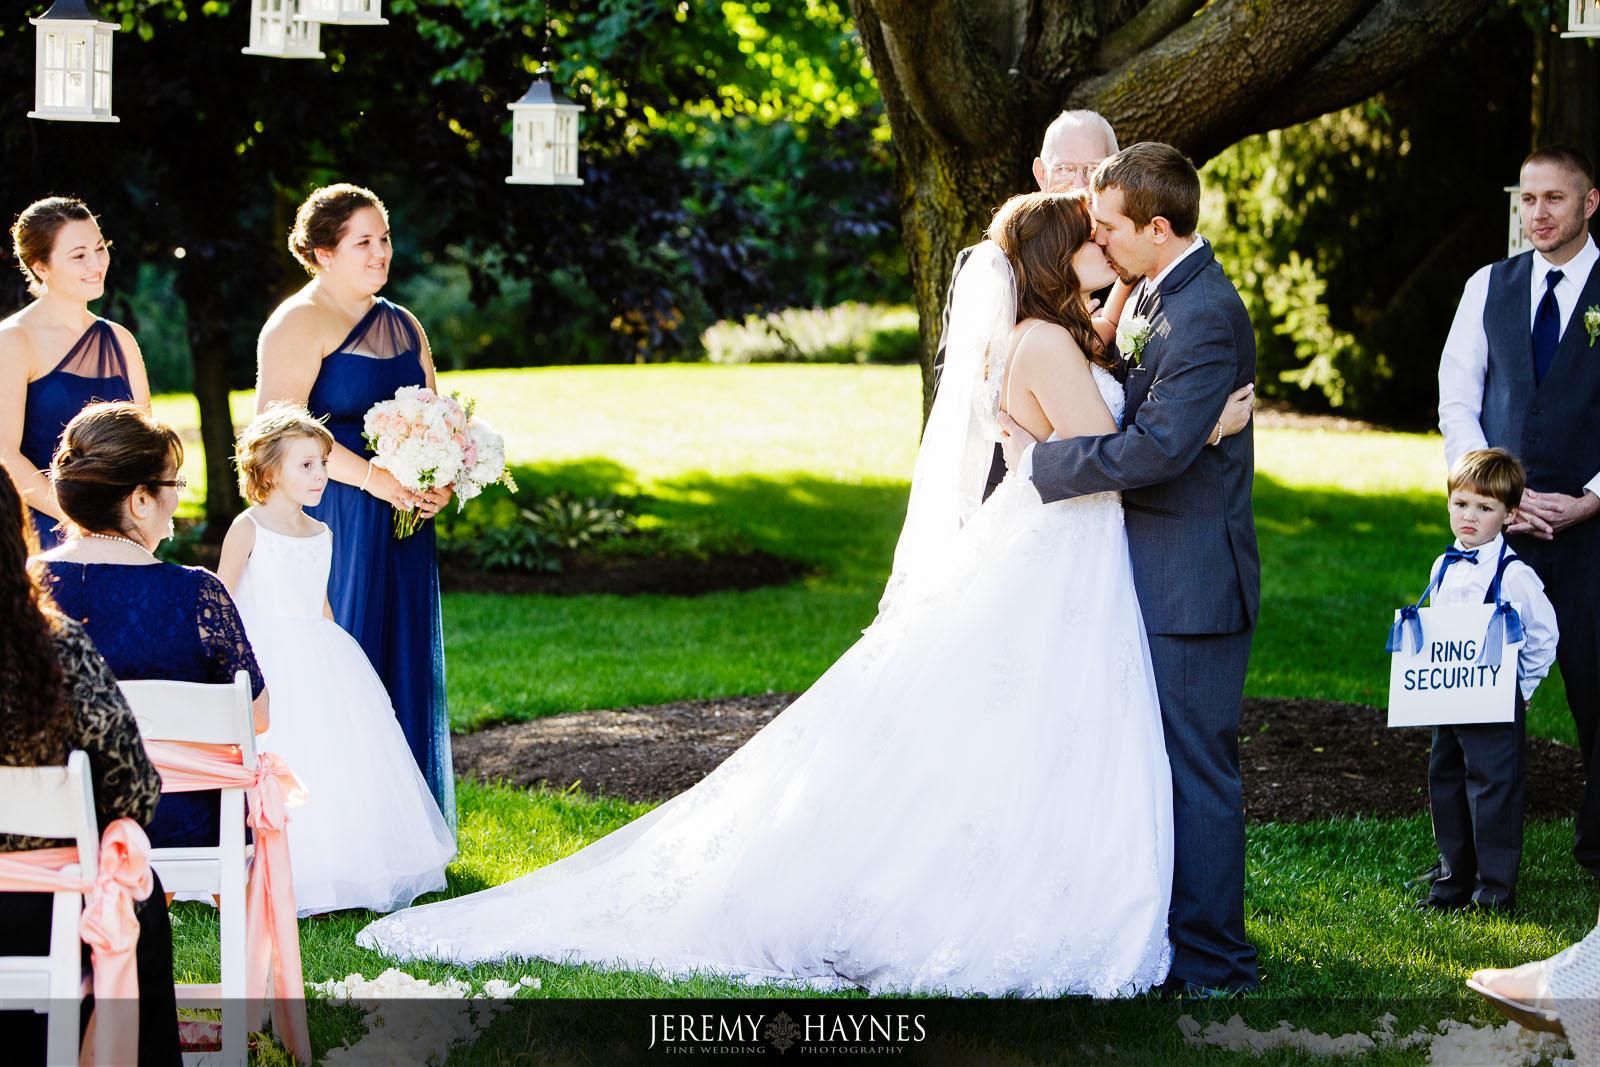 outdoor-natural-avon-gardens-wedding-pictures-jeremy-haynes-photography.jpg